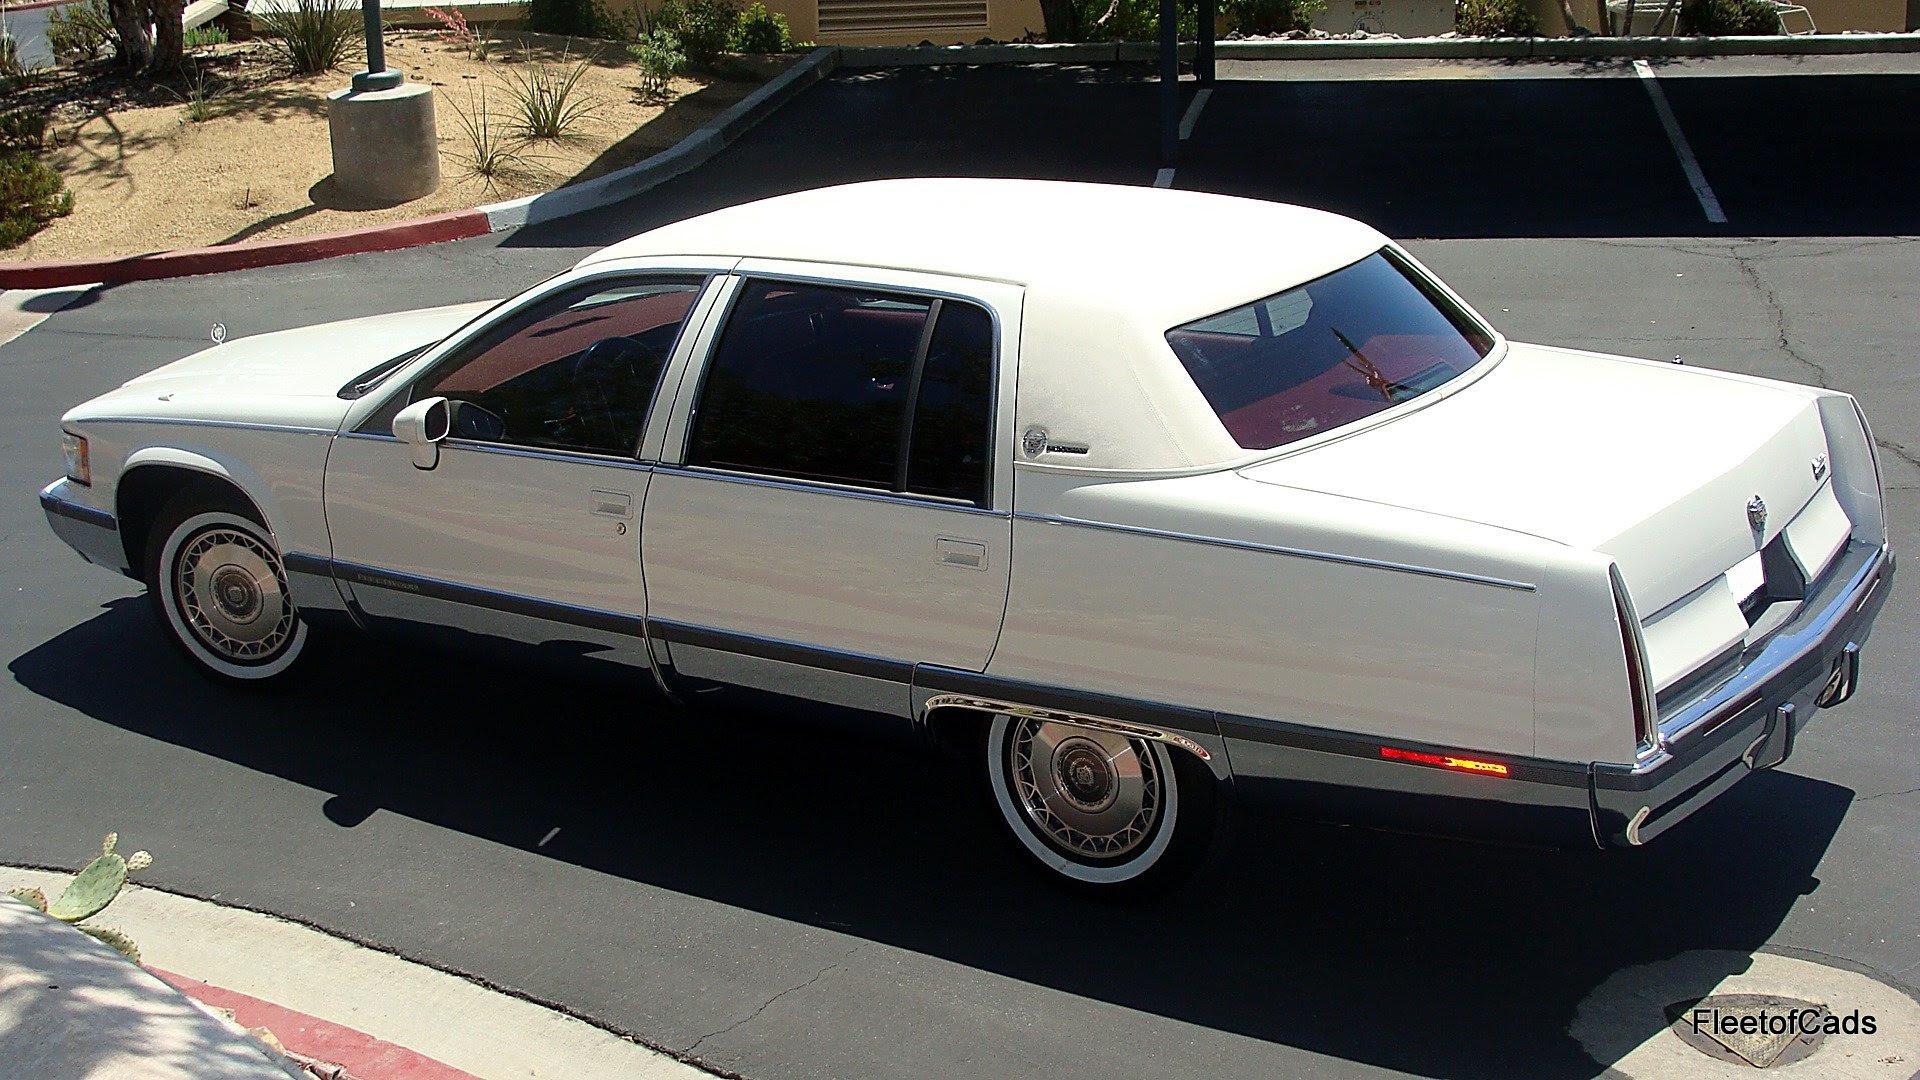 1993 Cadillac Fleetwood Brougham 48k miles